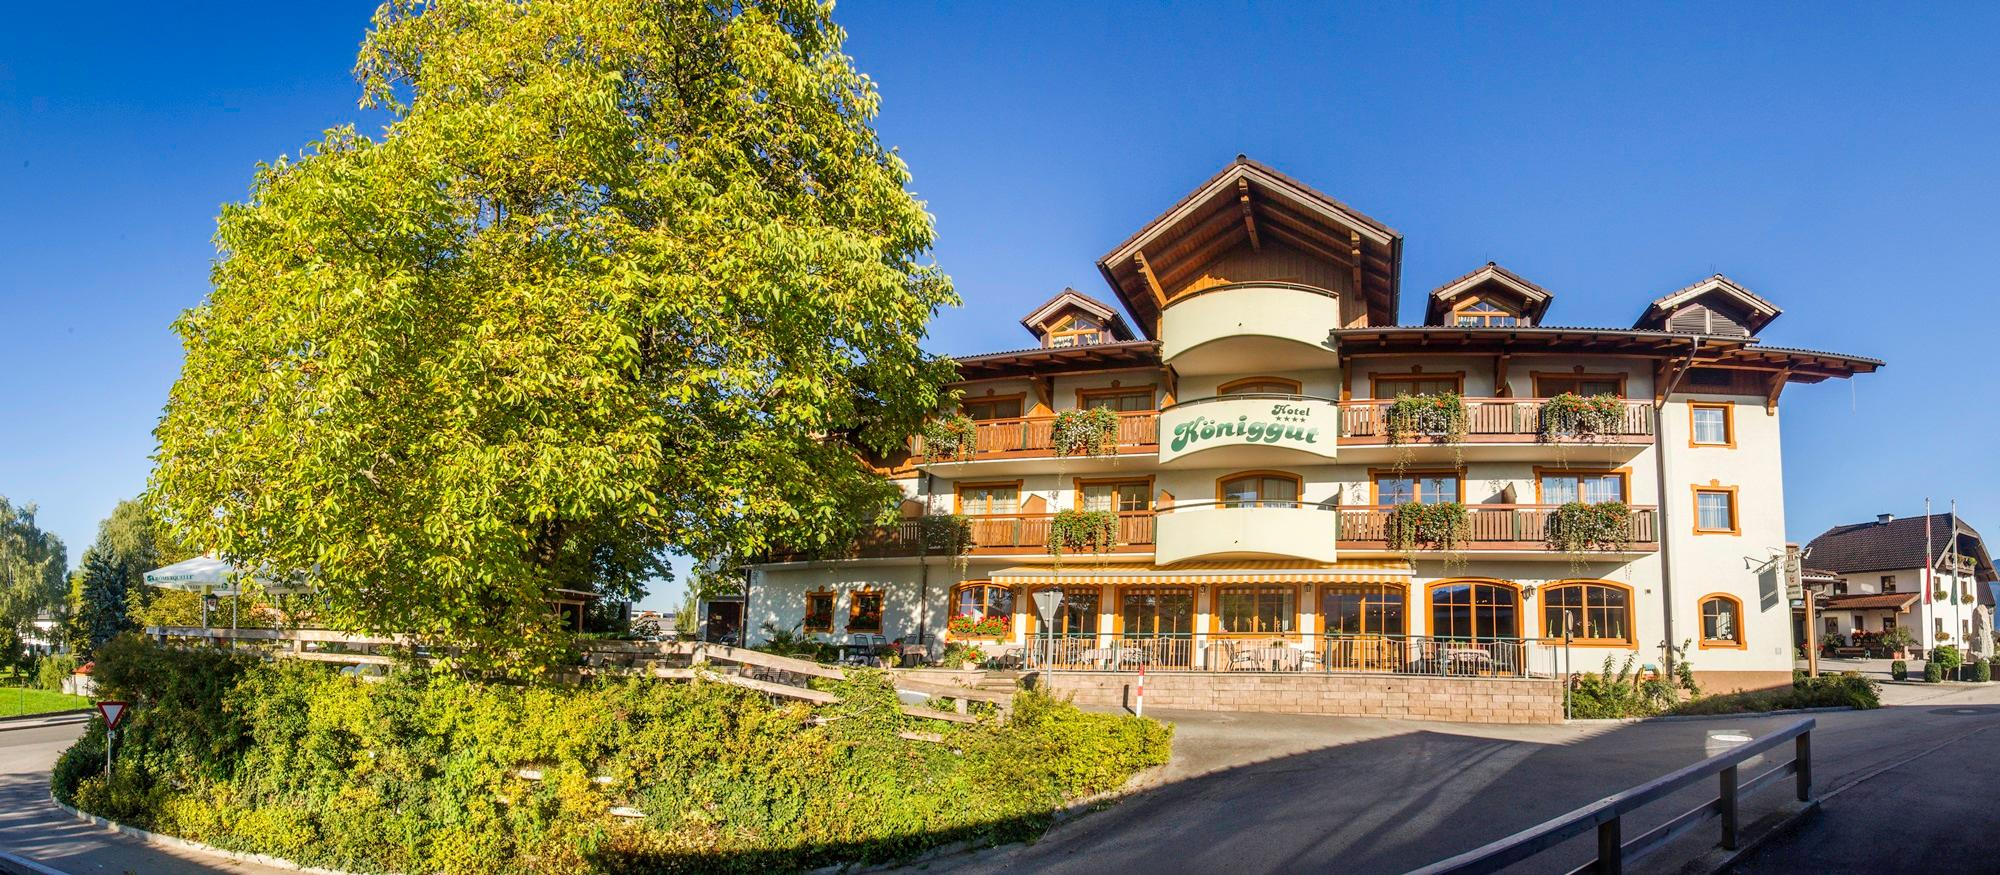 Hotel Koeniggut